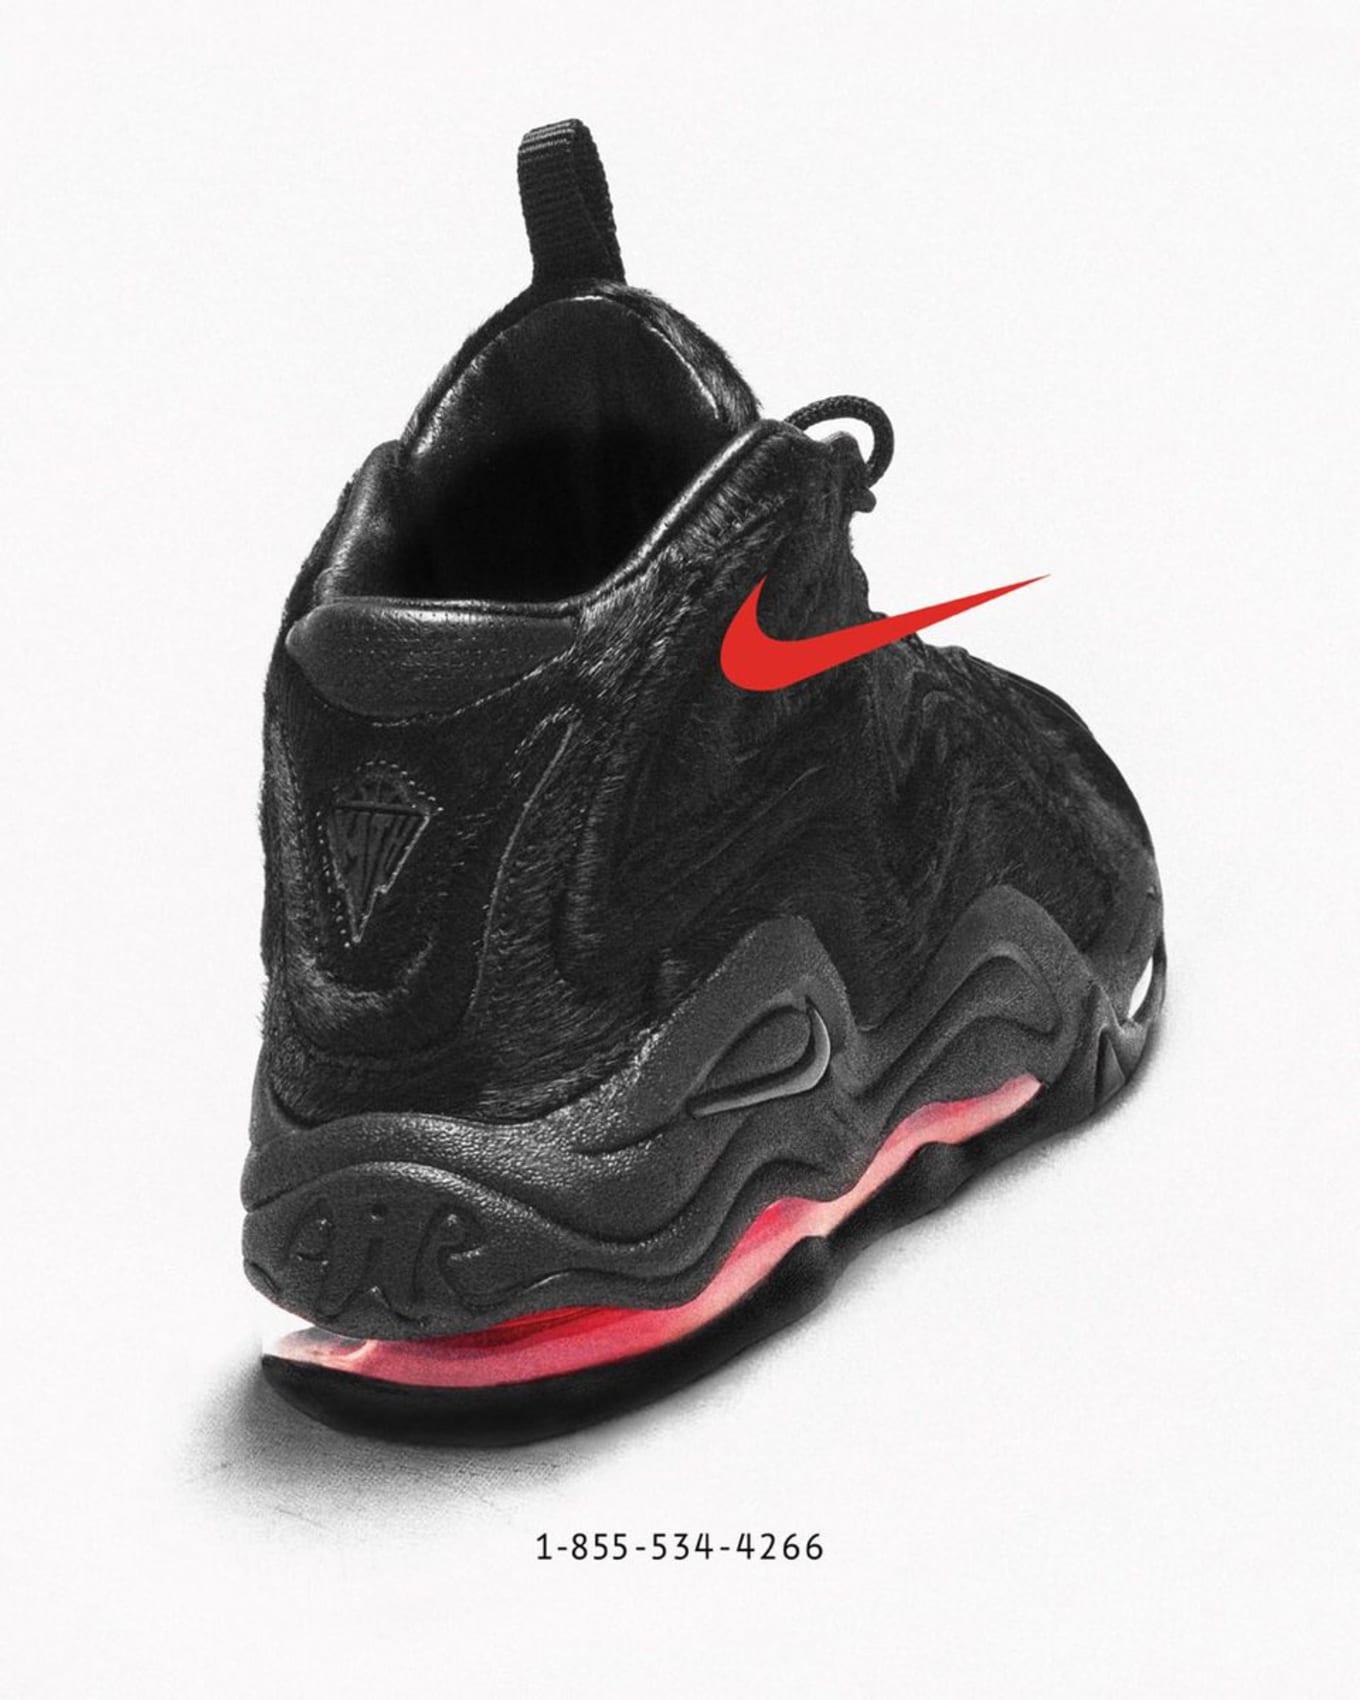 53c53b061e9 Ronnie Fieg and Scottie Pippen Recreate a Classic Nike Ad Campaign